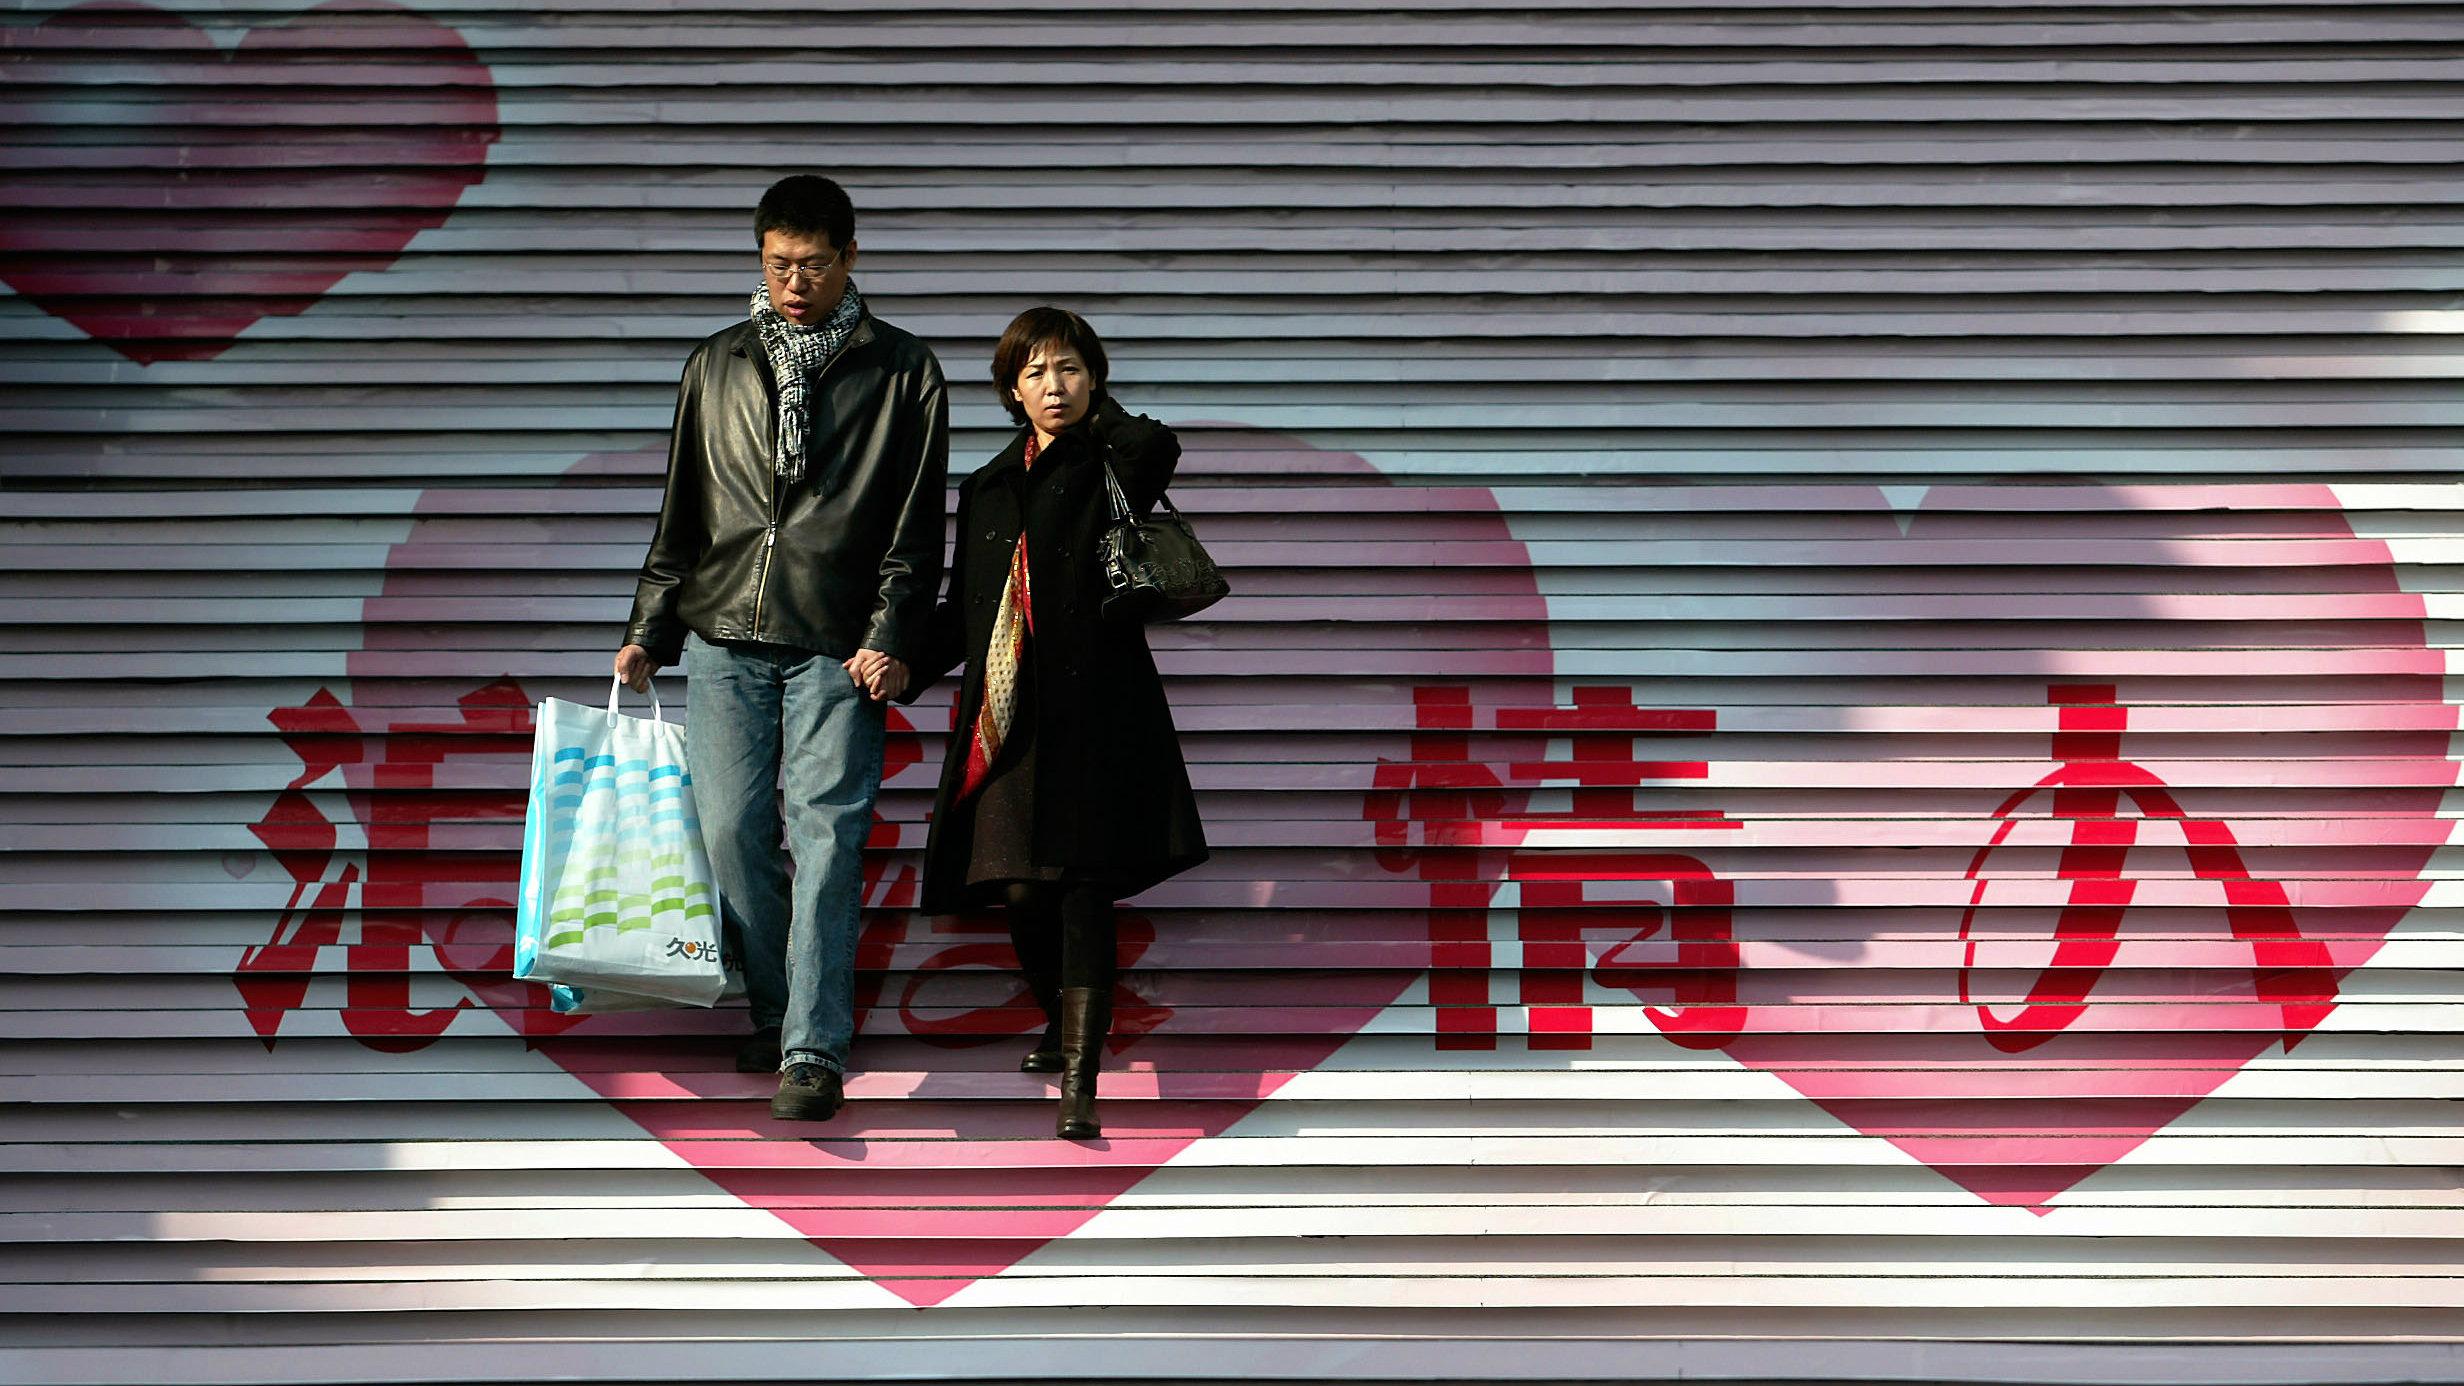 Chinese speed dating sydney